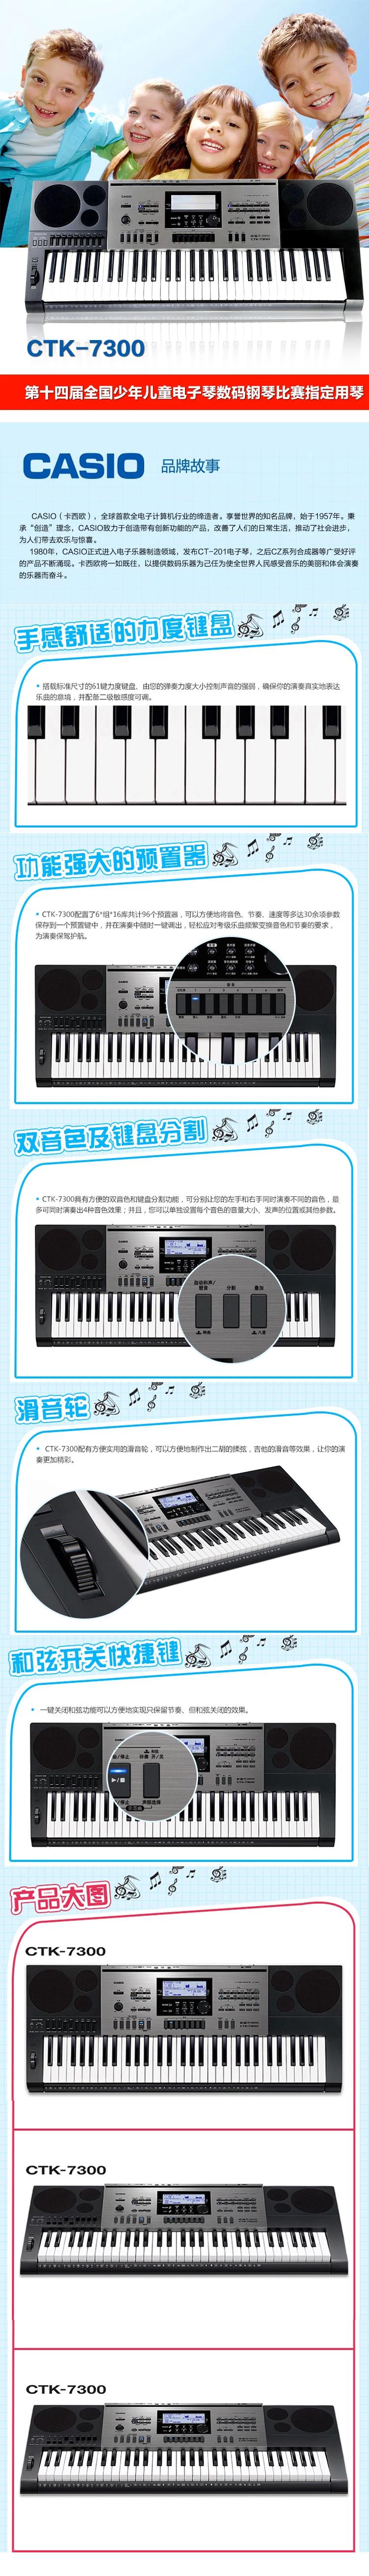 tk-7300电子琴ctk-7300图片